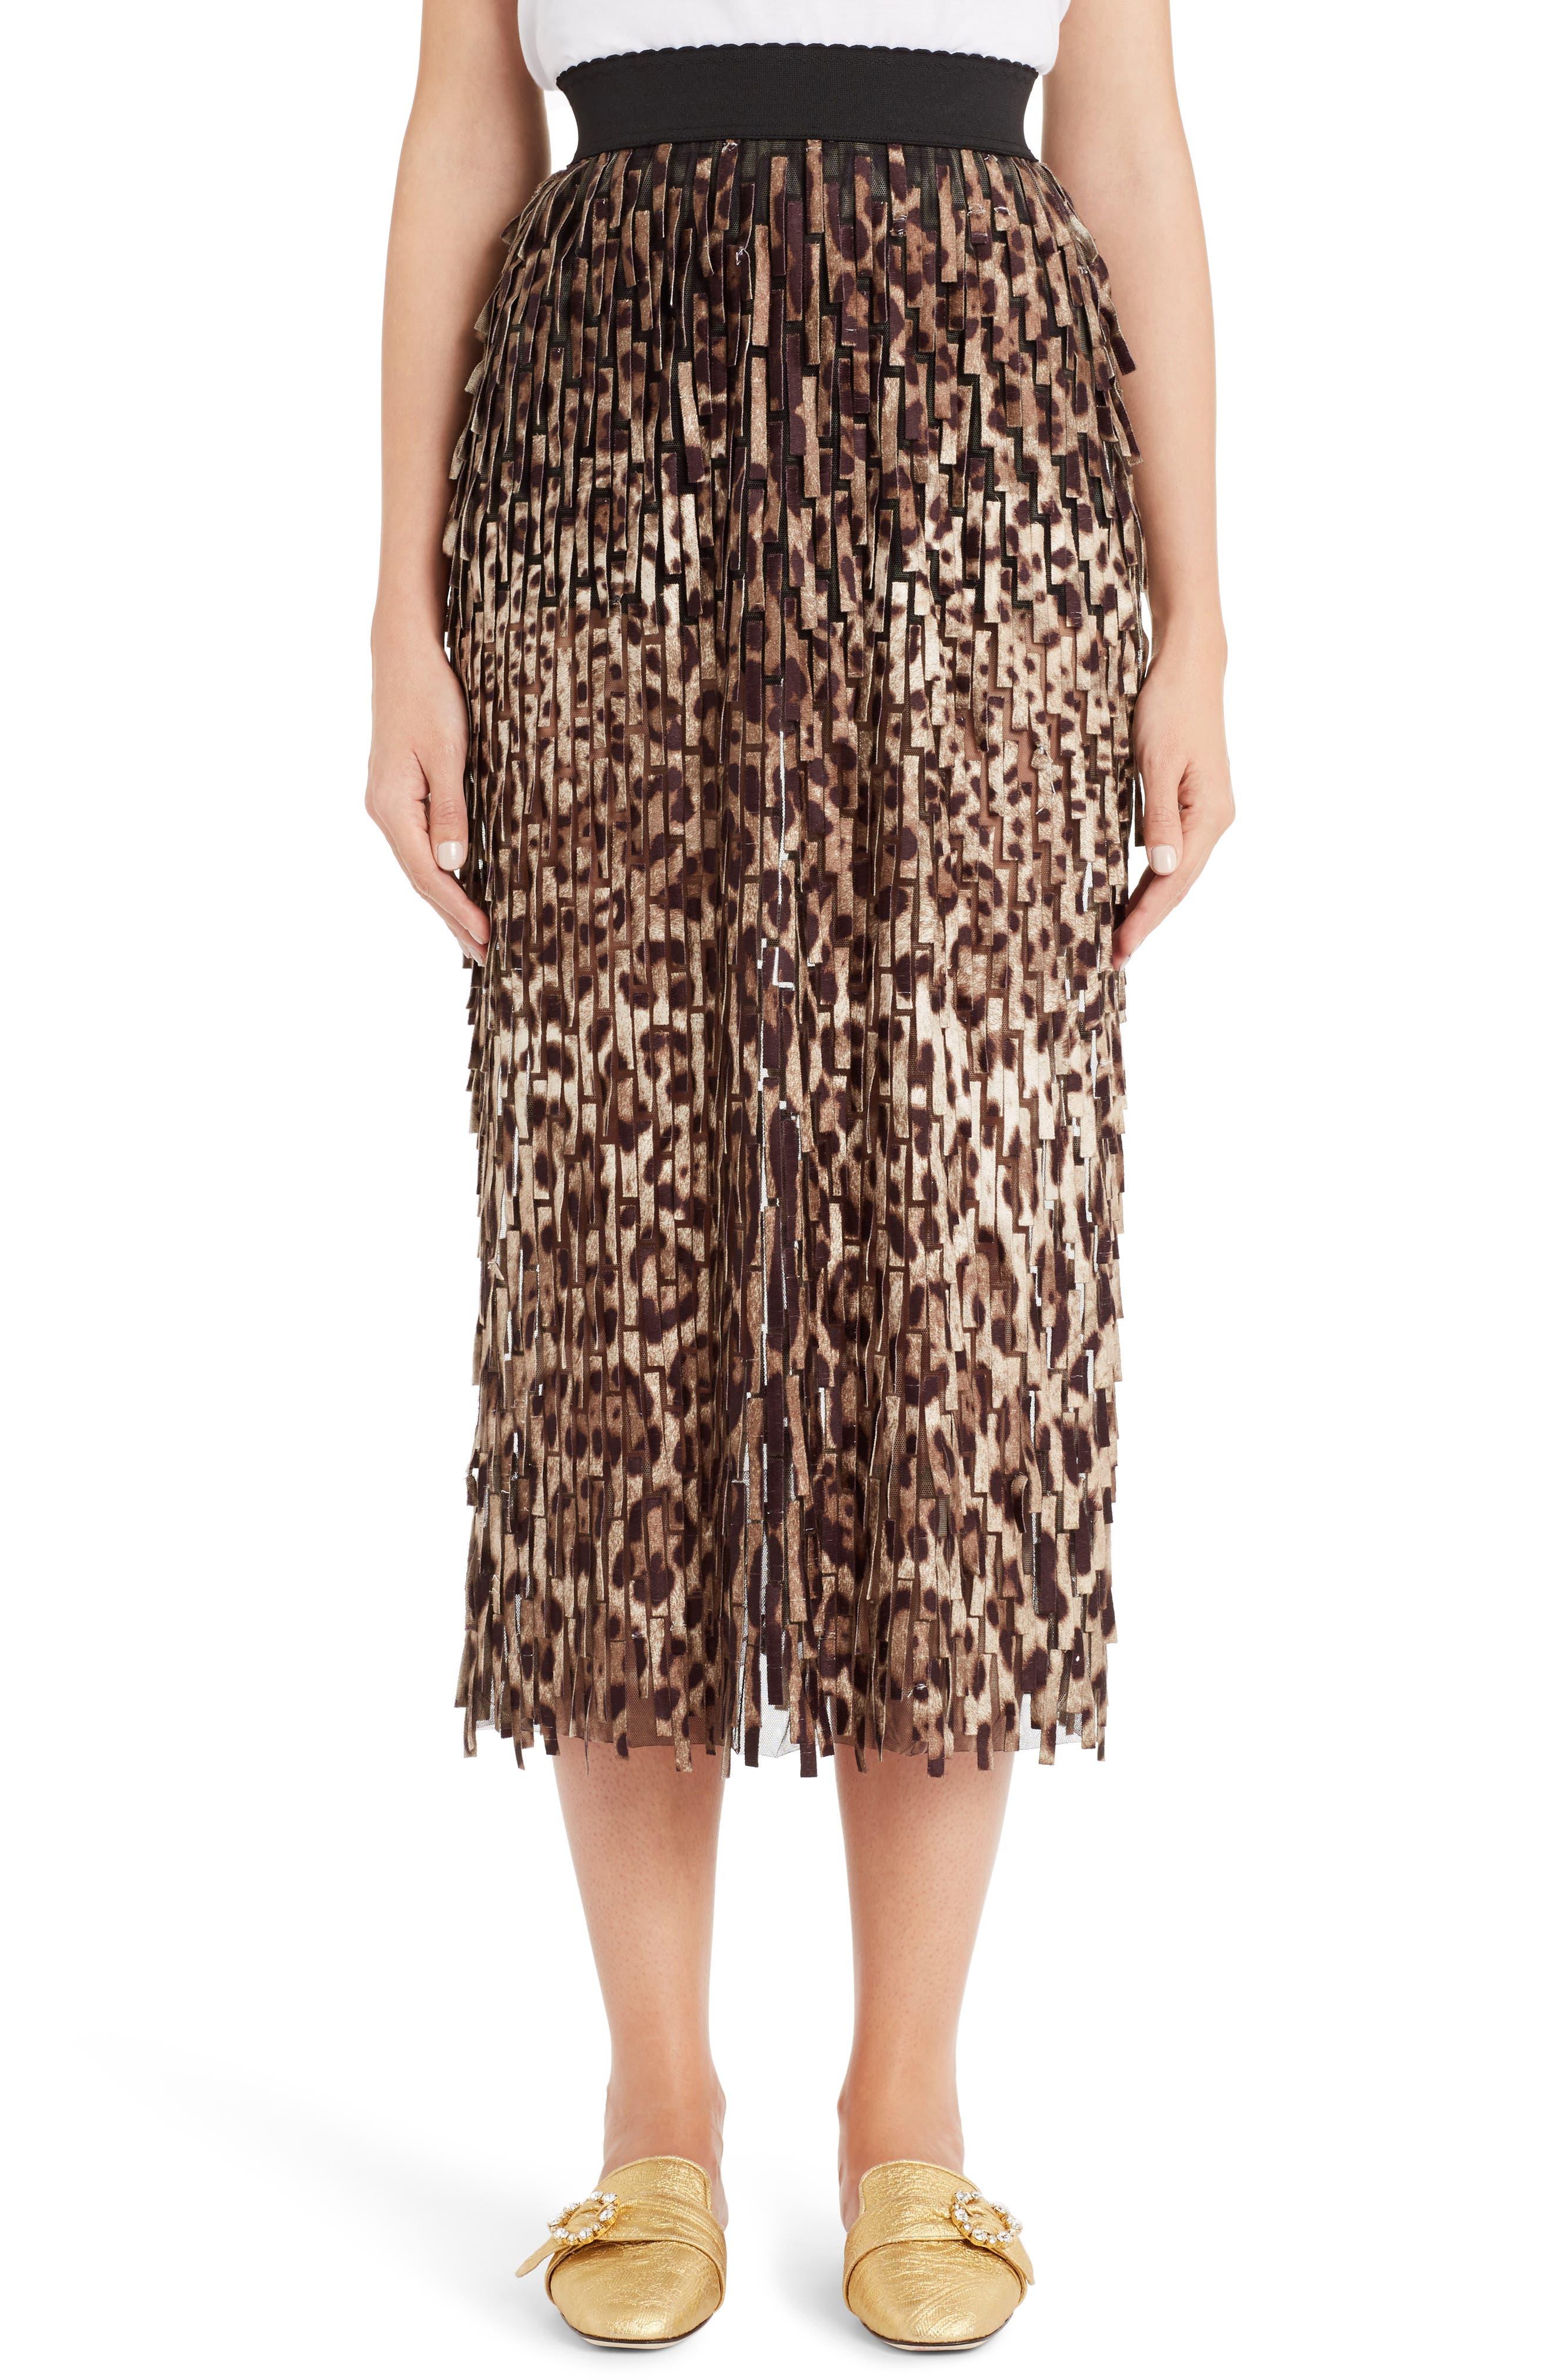 DOLCE&GABBANA Leopard Print Fringe Pencil Skirt